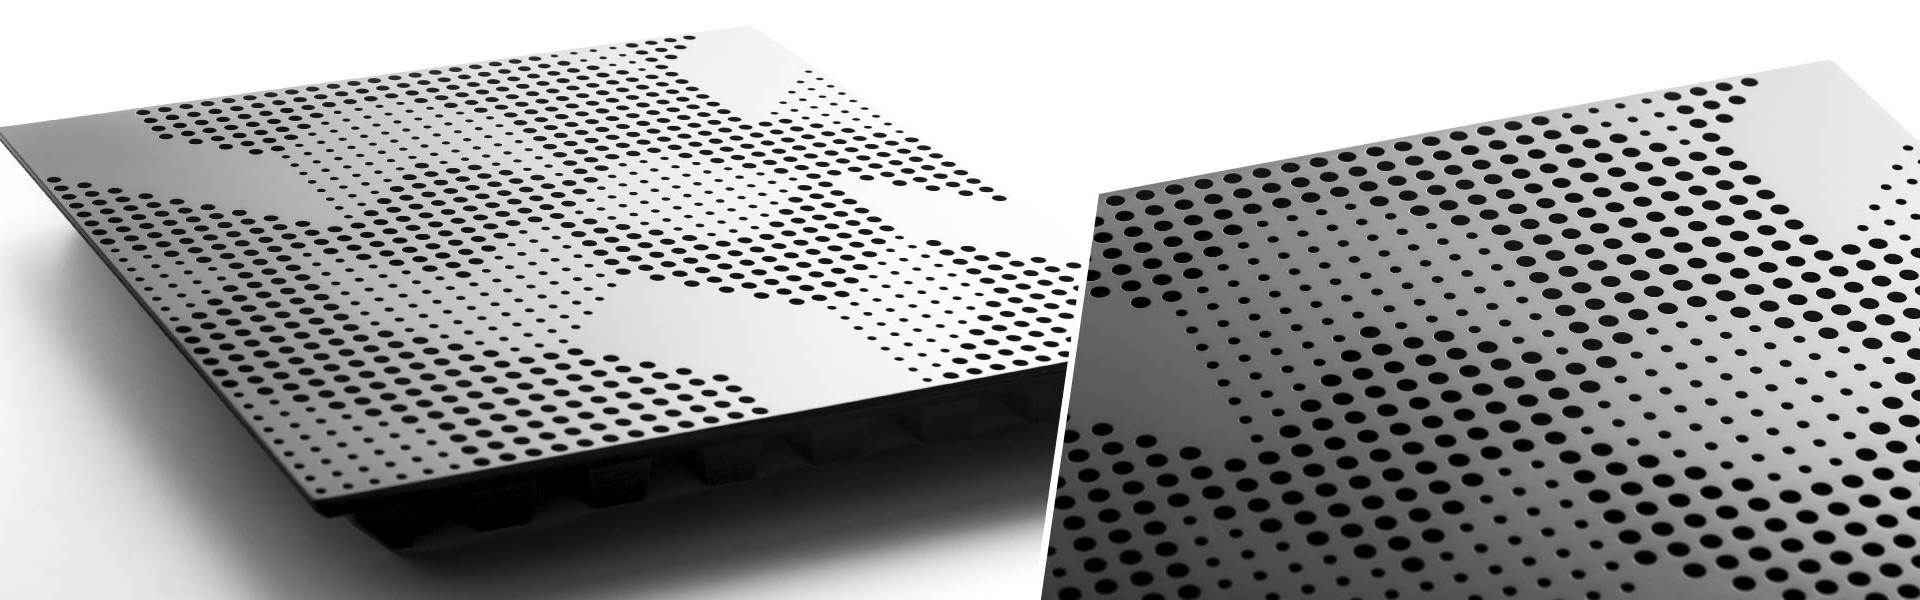 artnovion-product-komodo-w-absorber-08b1